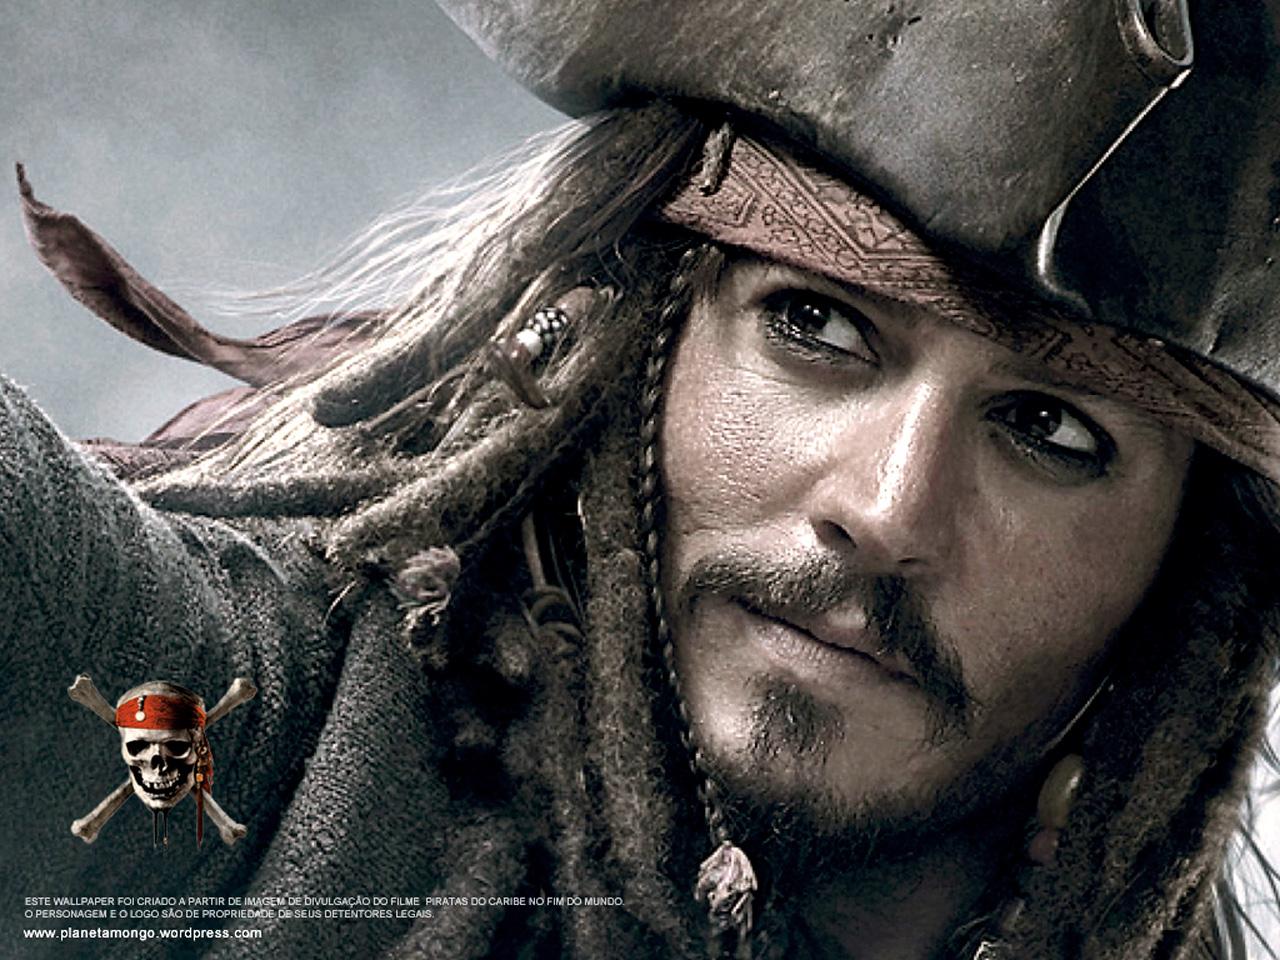 http://3.bp.blogspot.com/-Jg4QHRtY2Nw/TVov52Qq_cI/AAAAAAAAA3M/ciOsXaWaBUQ/s1600/piratas-do-caribe-jack-sparrow-johnny-depp-efdb1.jpg